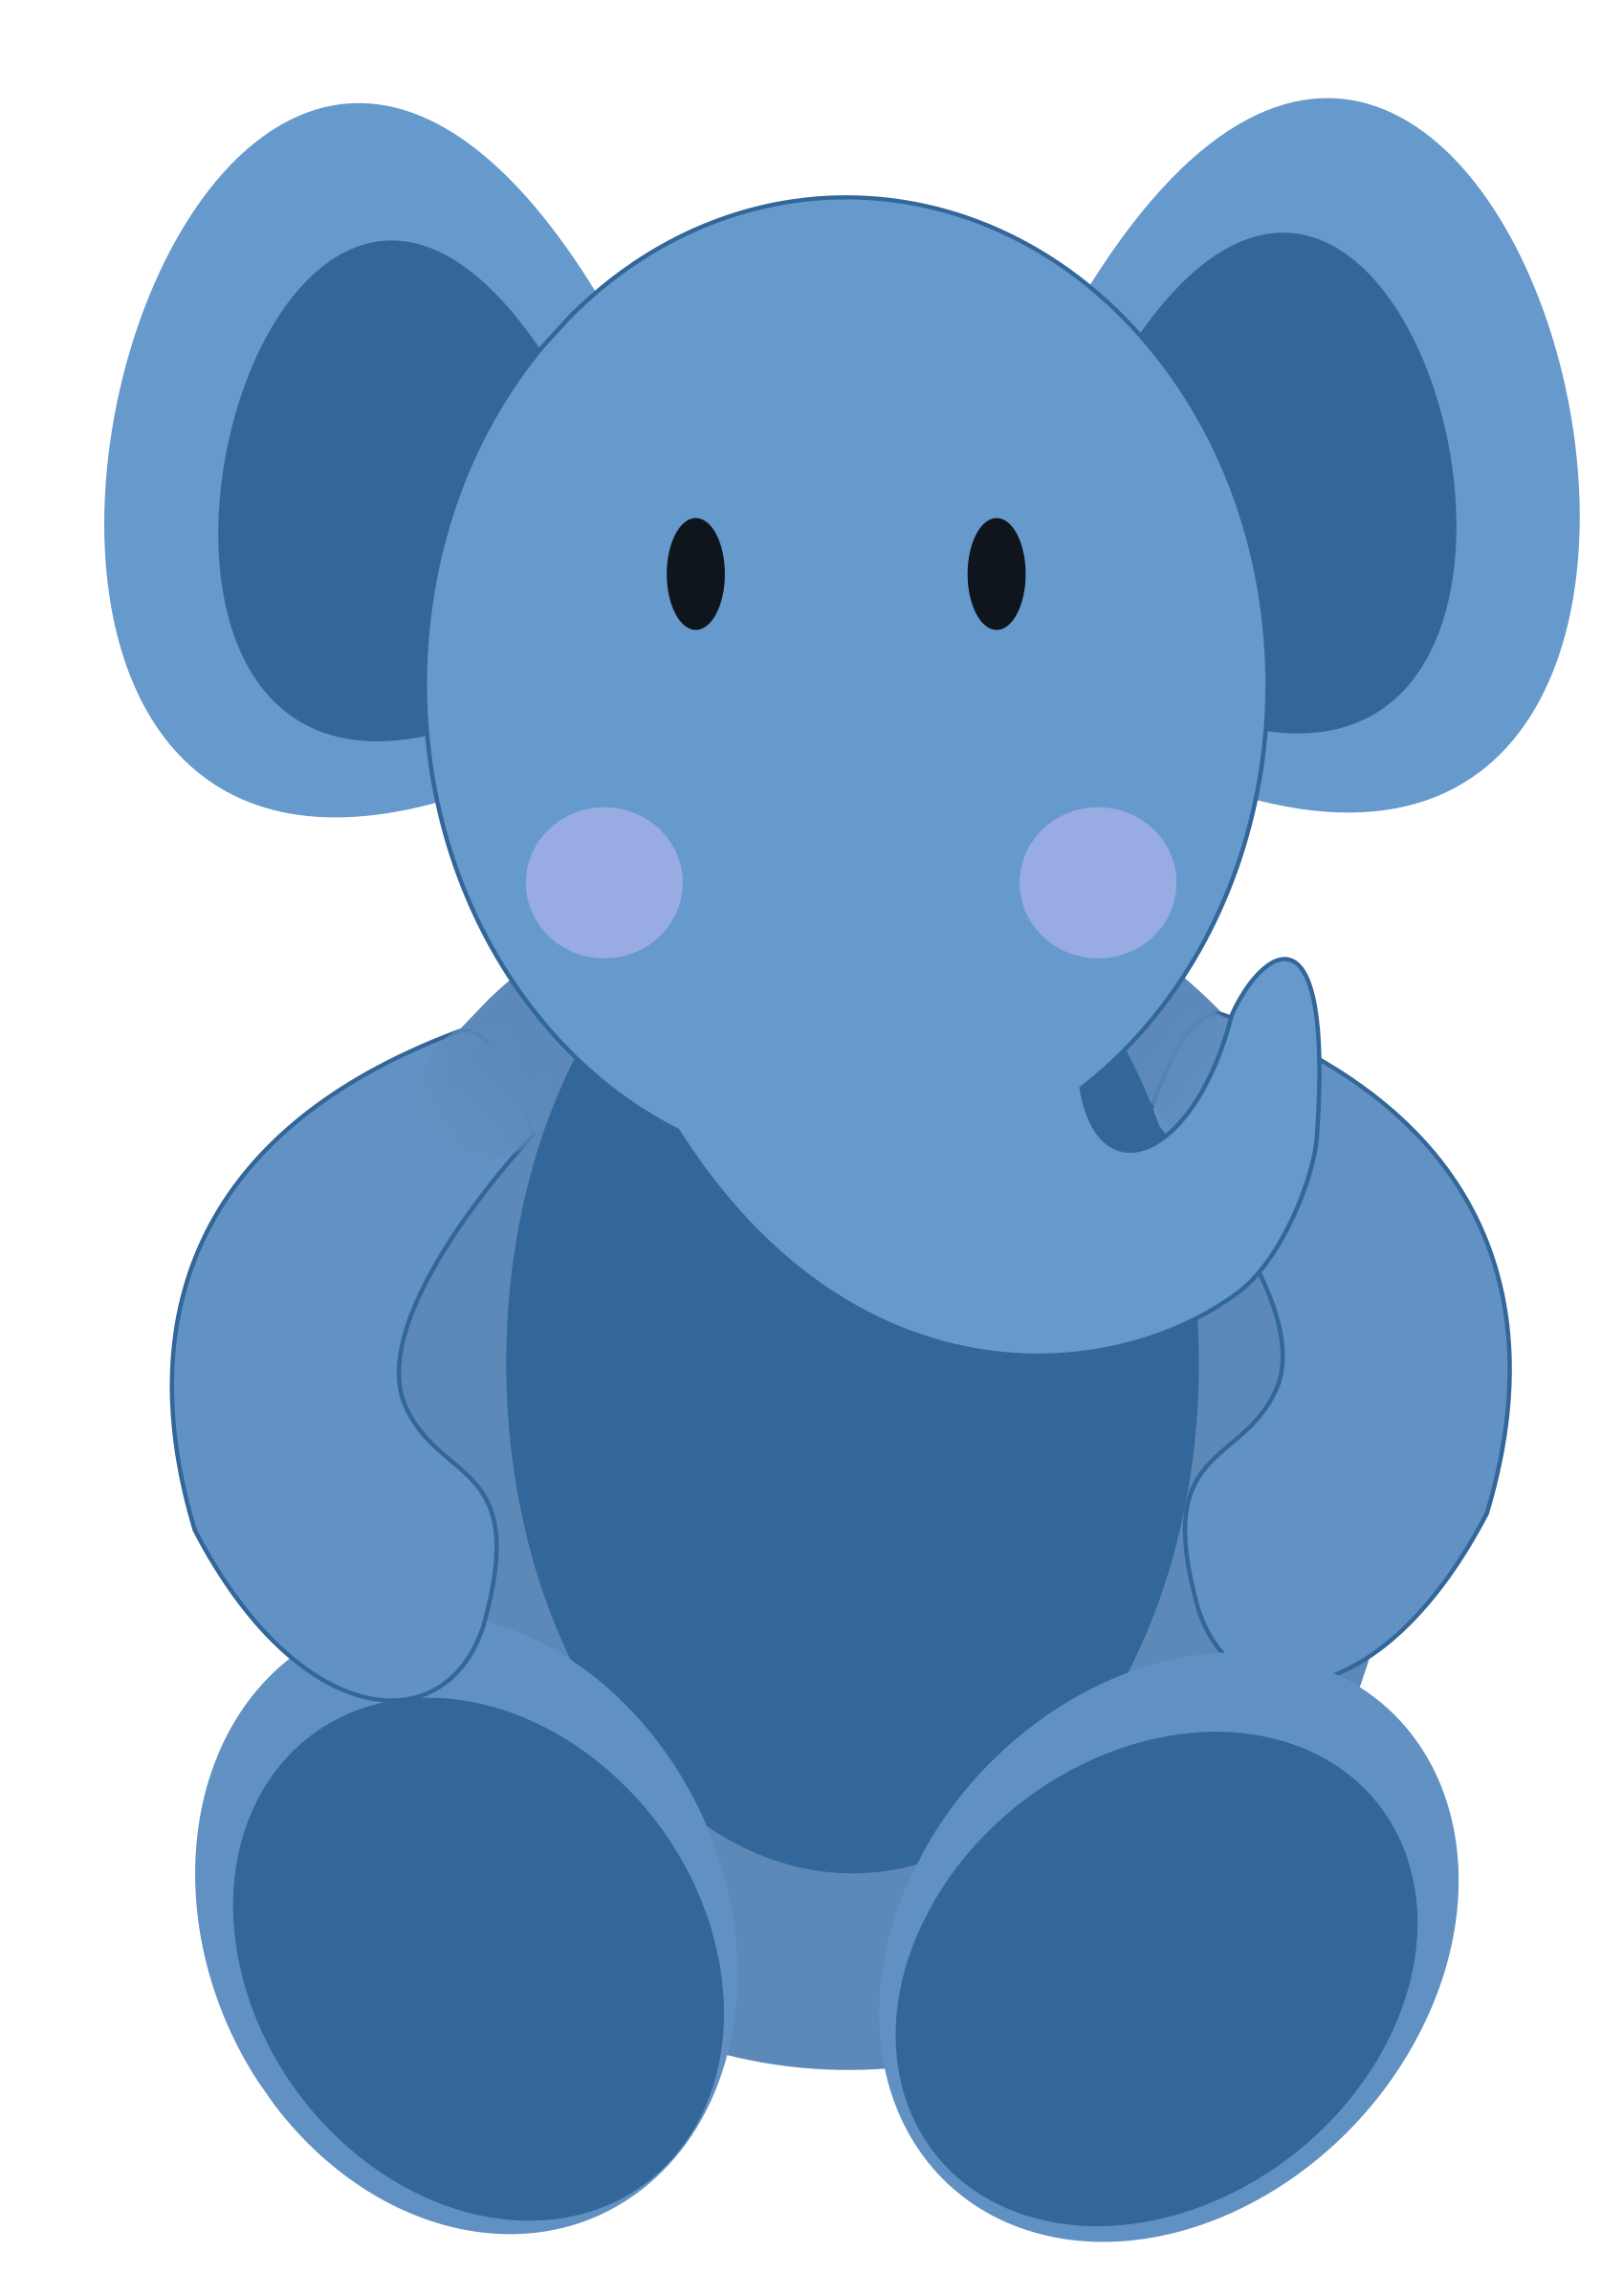 Baby big image png. Infant clipart pink blue elephant